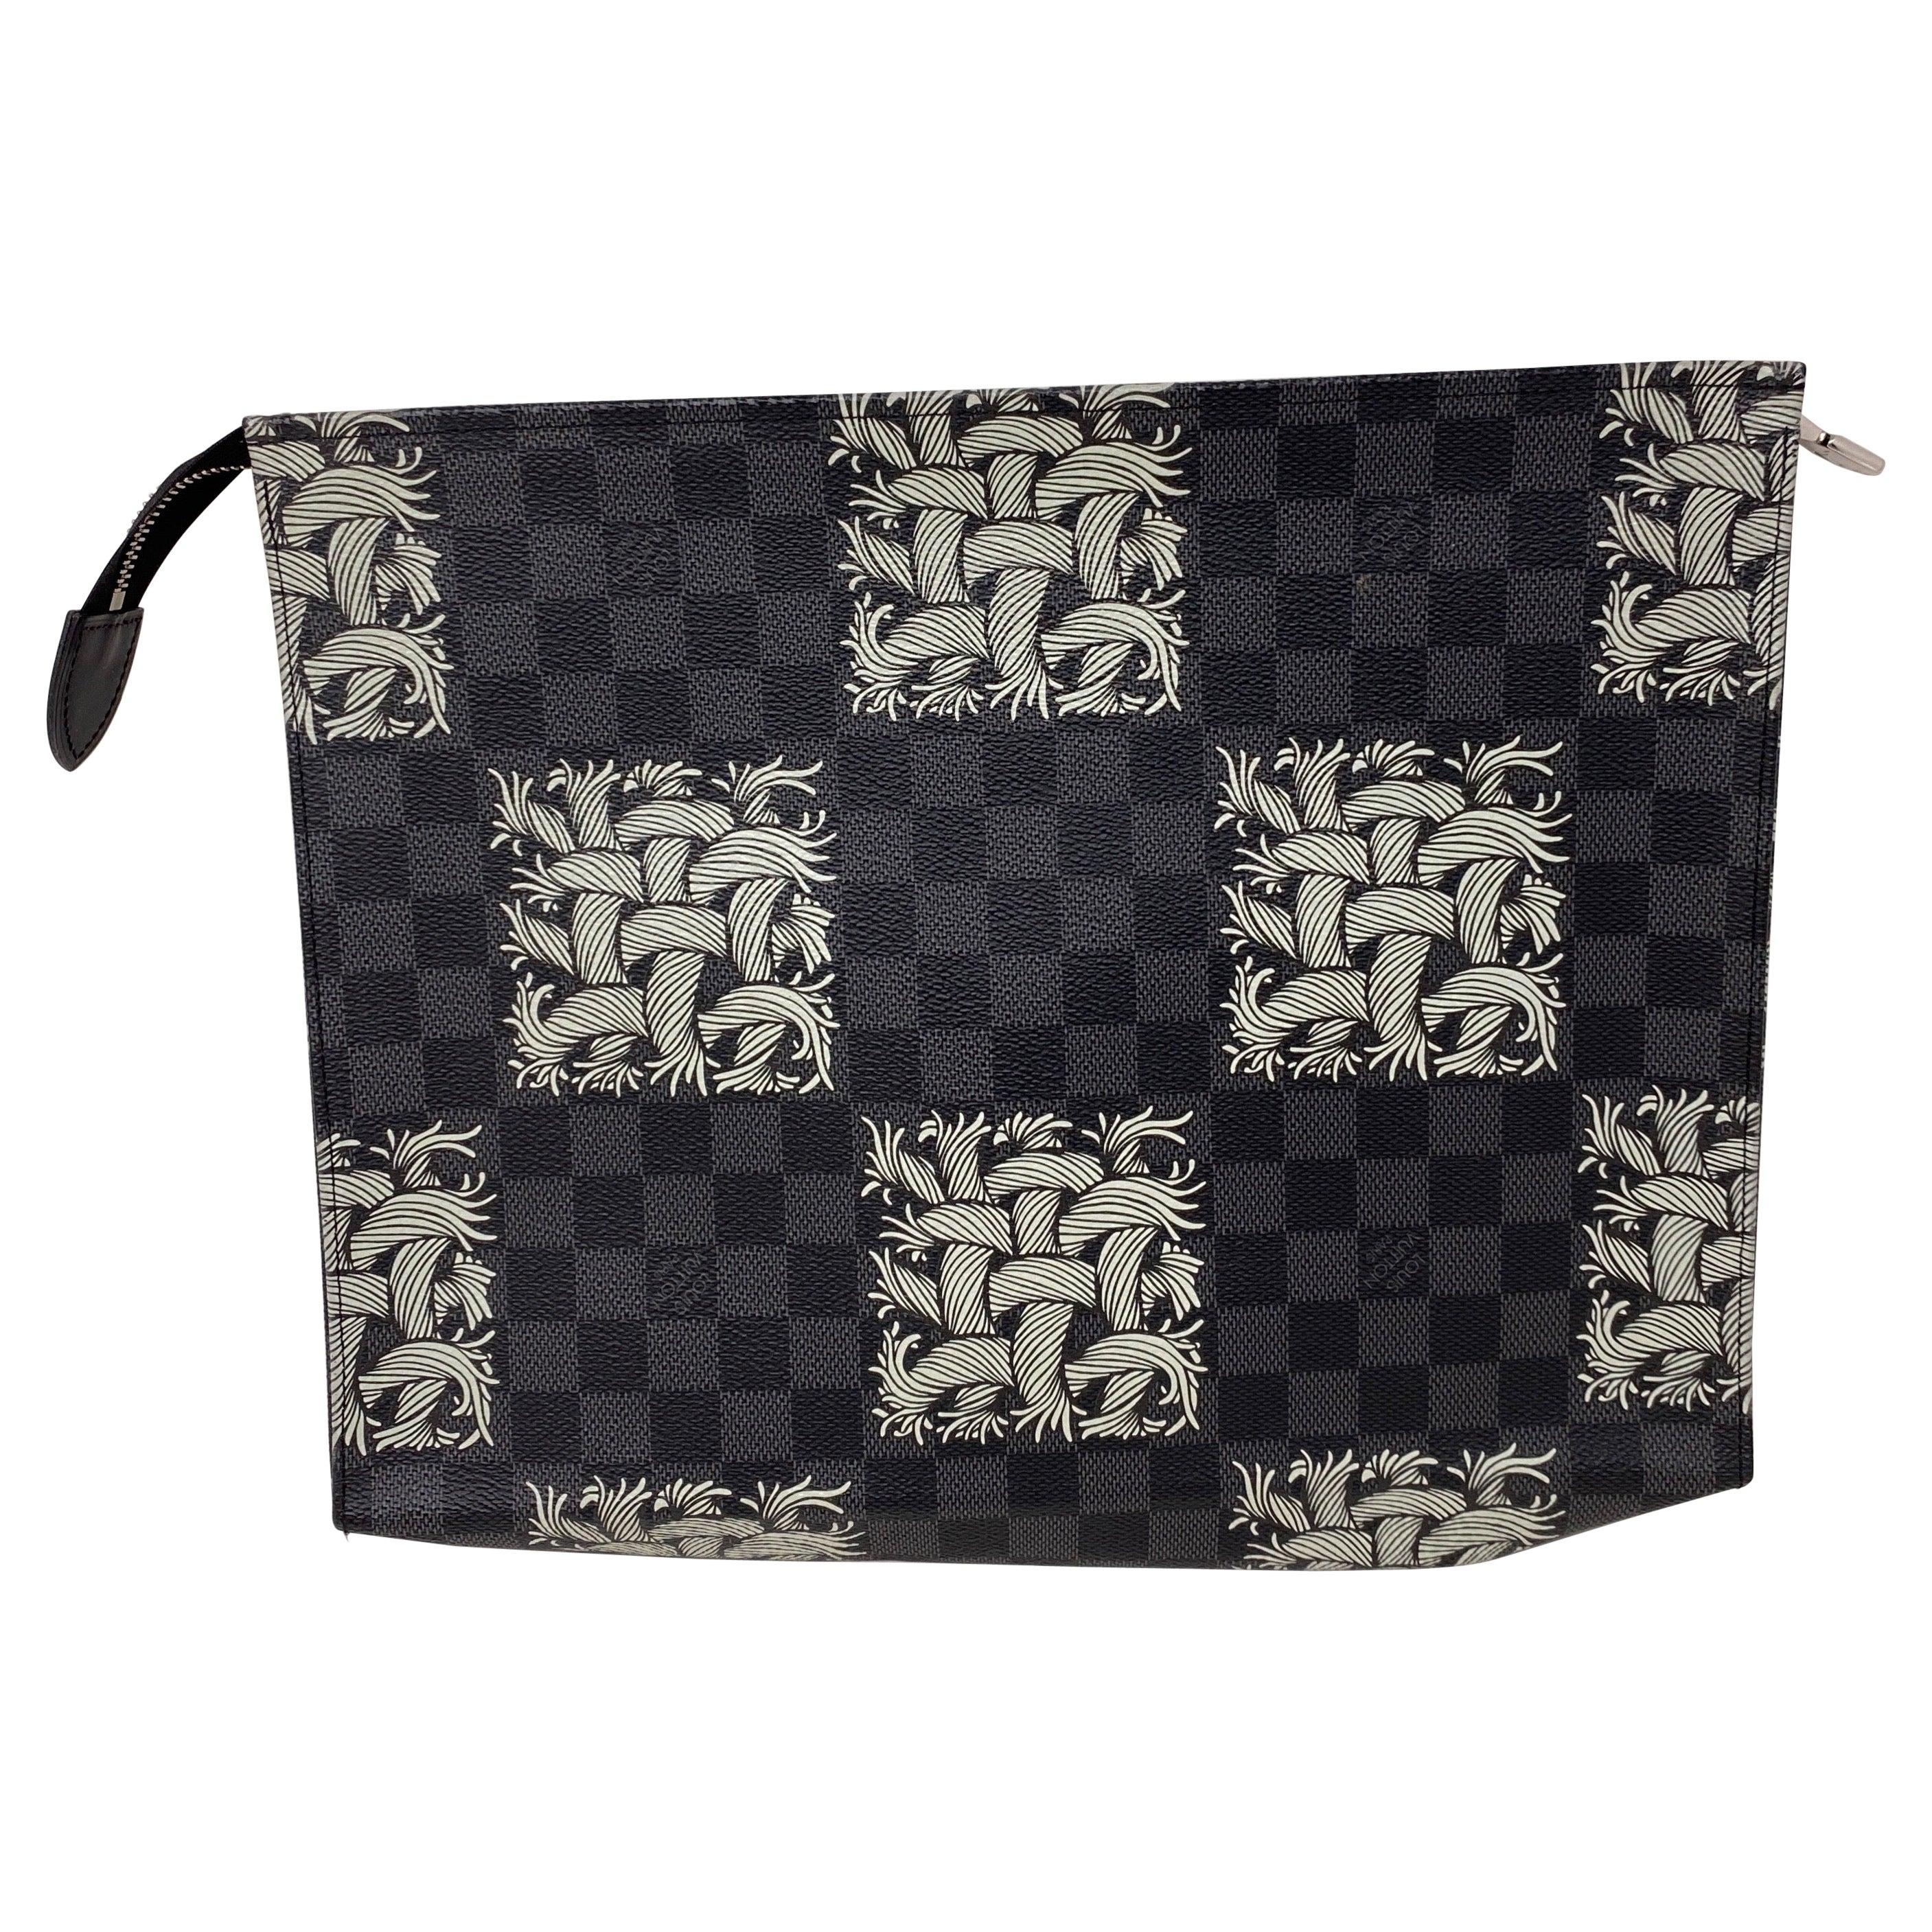 Louis Vuitton Limited Edition Clutch